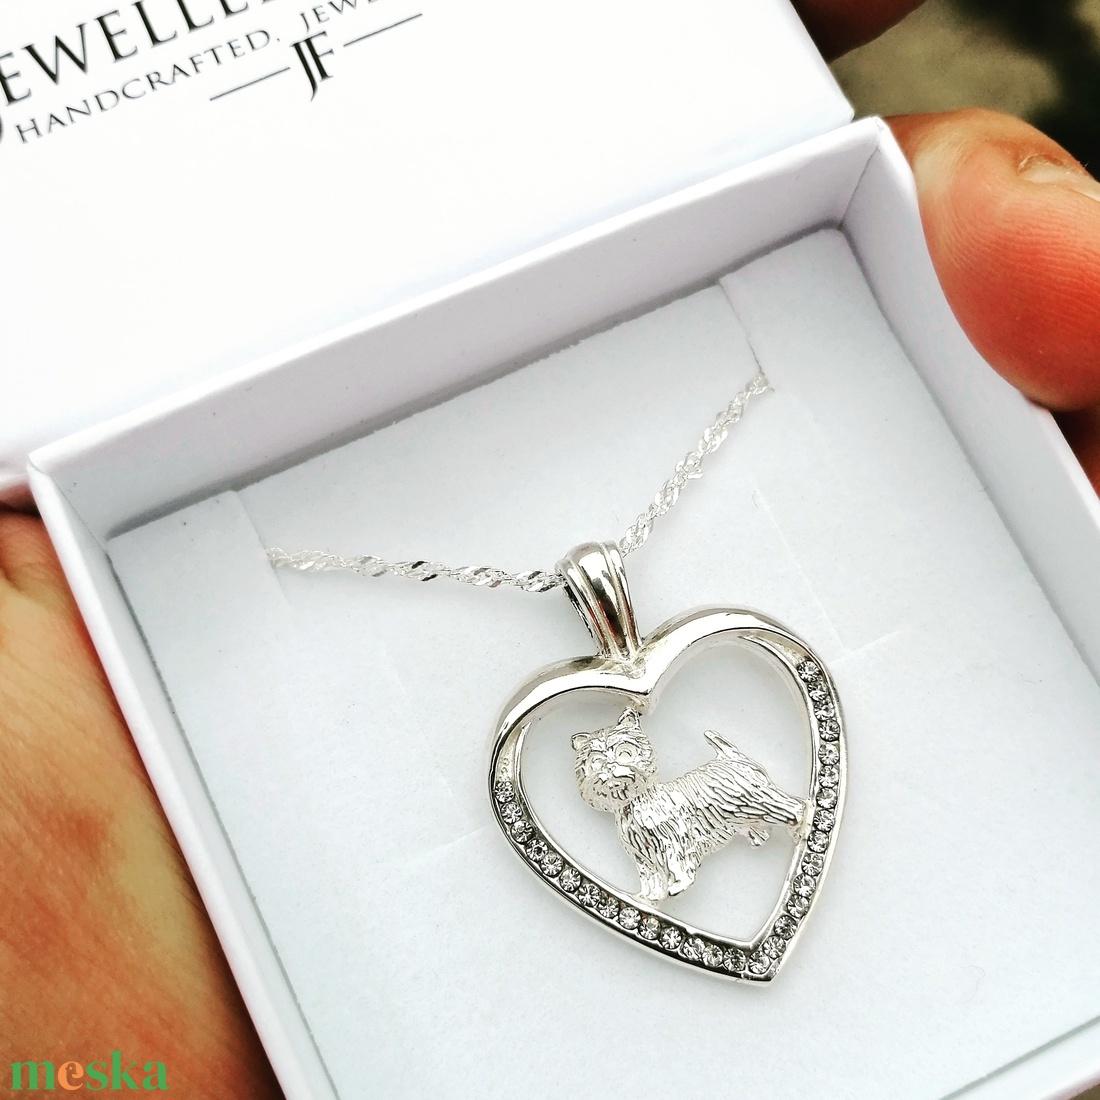 Westie ezüst medál Swarovski kővel díszítve nyaklánccal díszdobozban (jewelledfriend) - Meska.hu